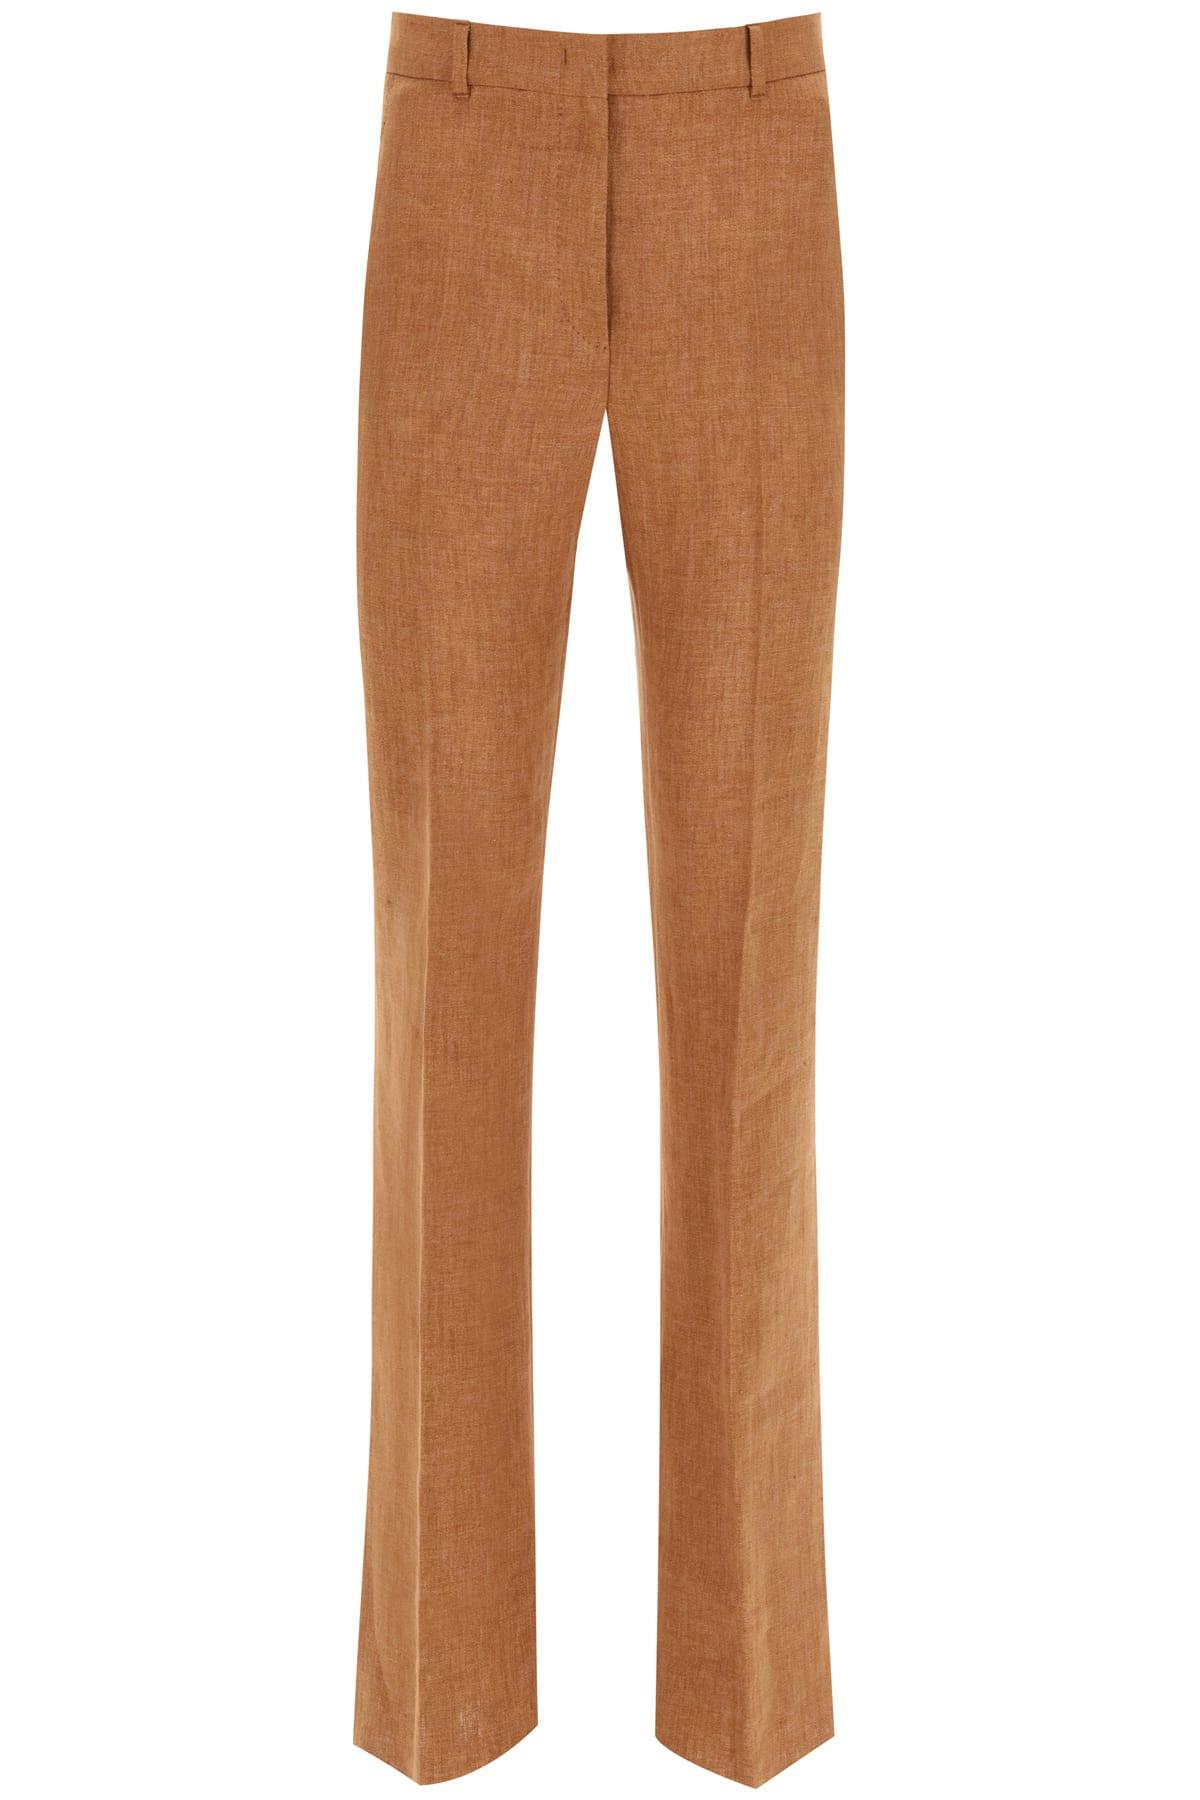 Siam Trousers In Linen Batavia